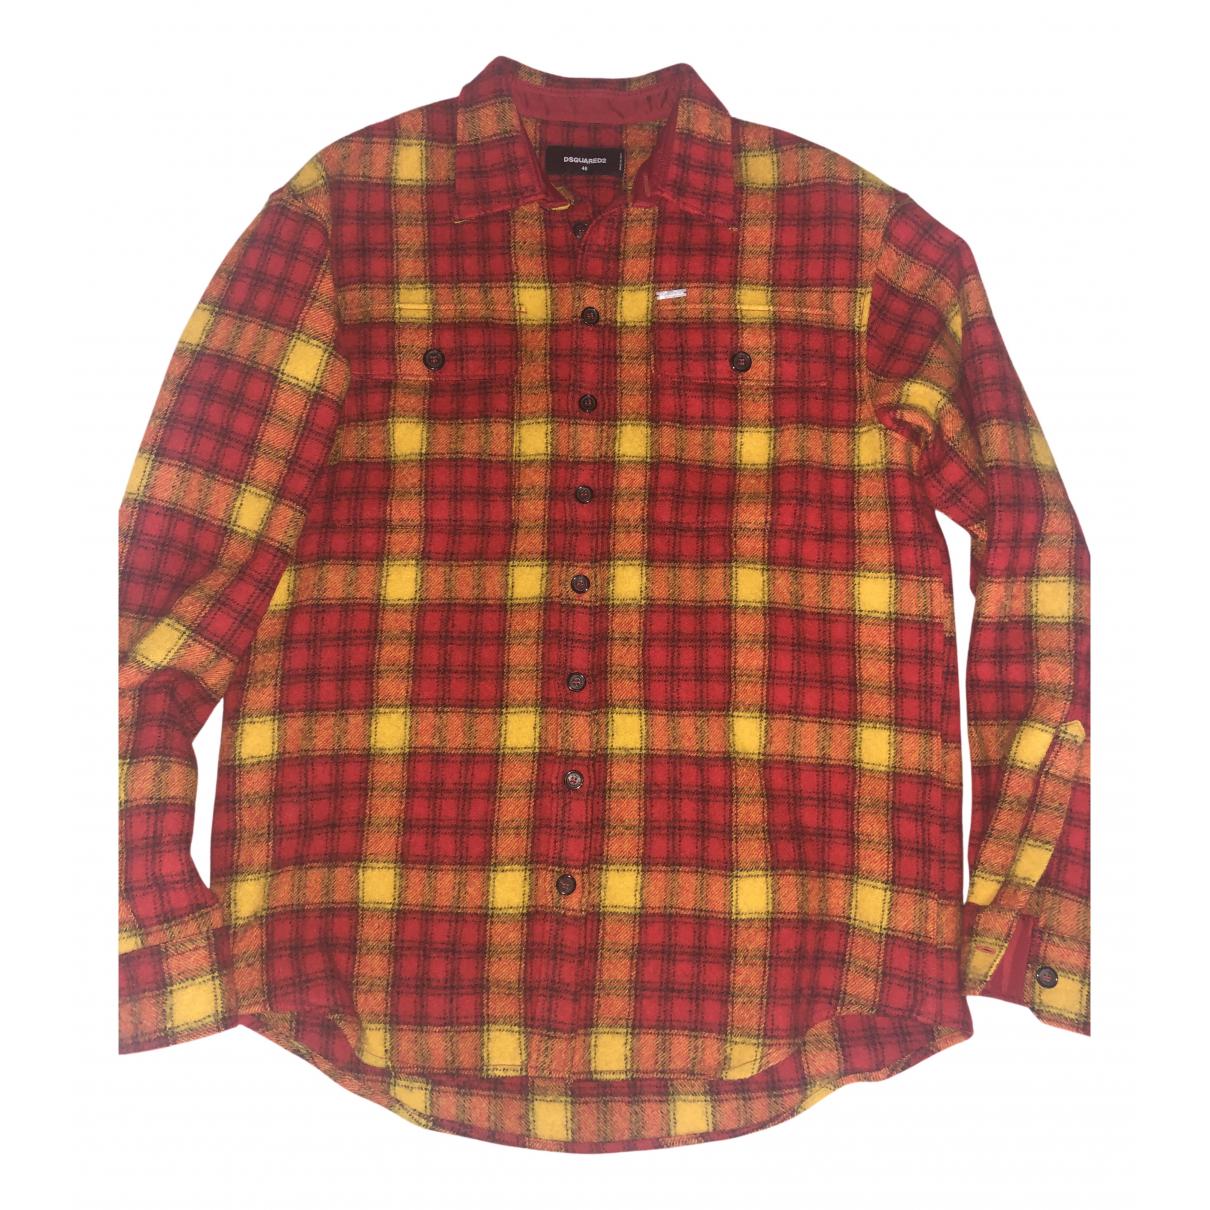 Camisas de Lana Dsquared2